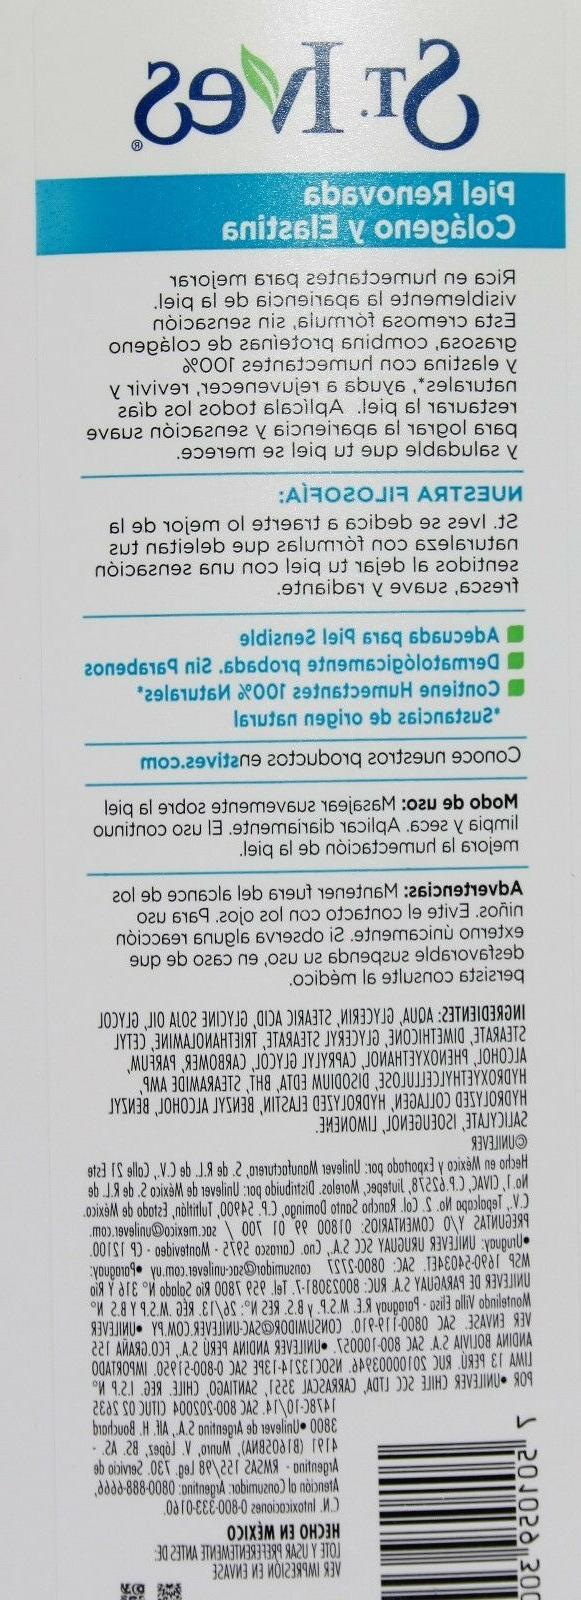 St. Skin Renewing Body Collagen and Elastin Lot